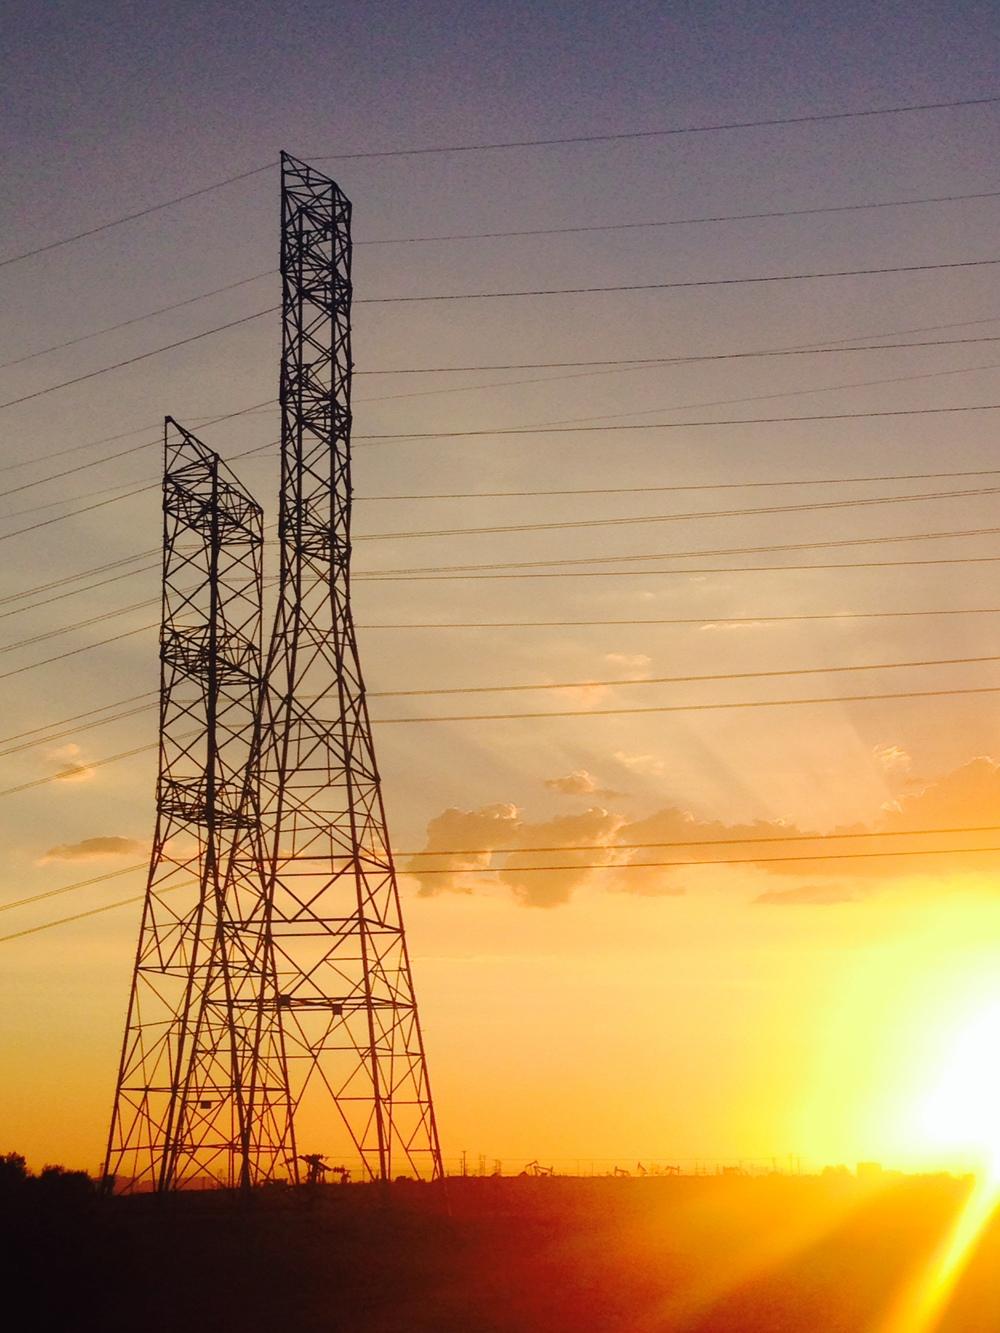 sunset tower1.JPG